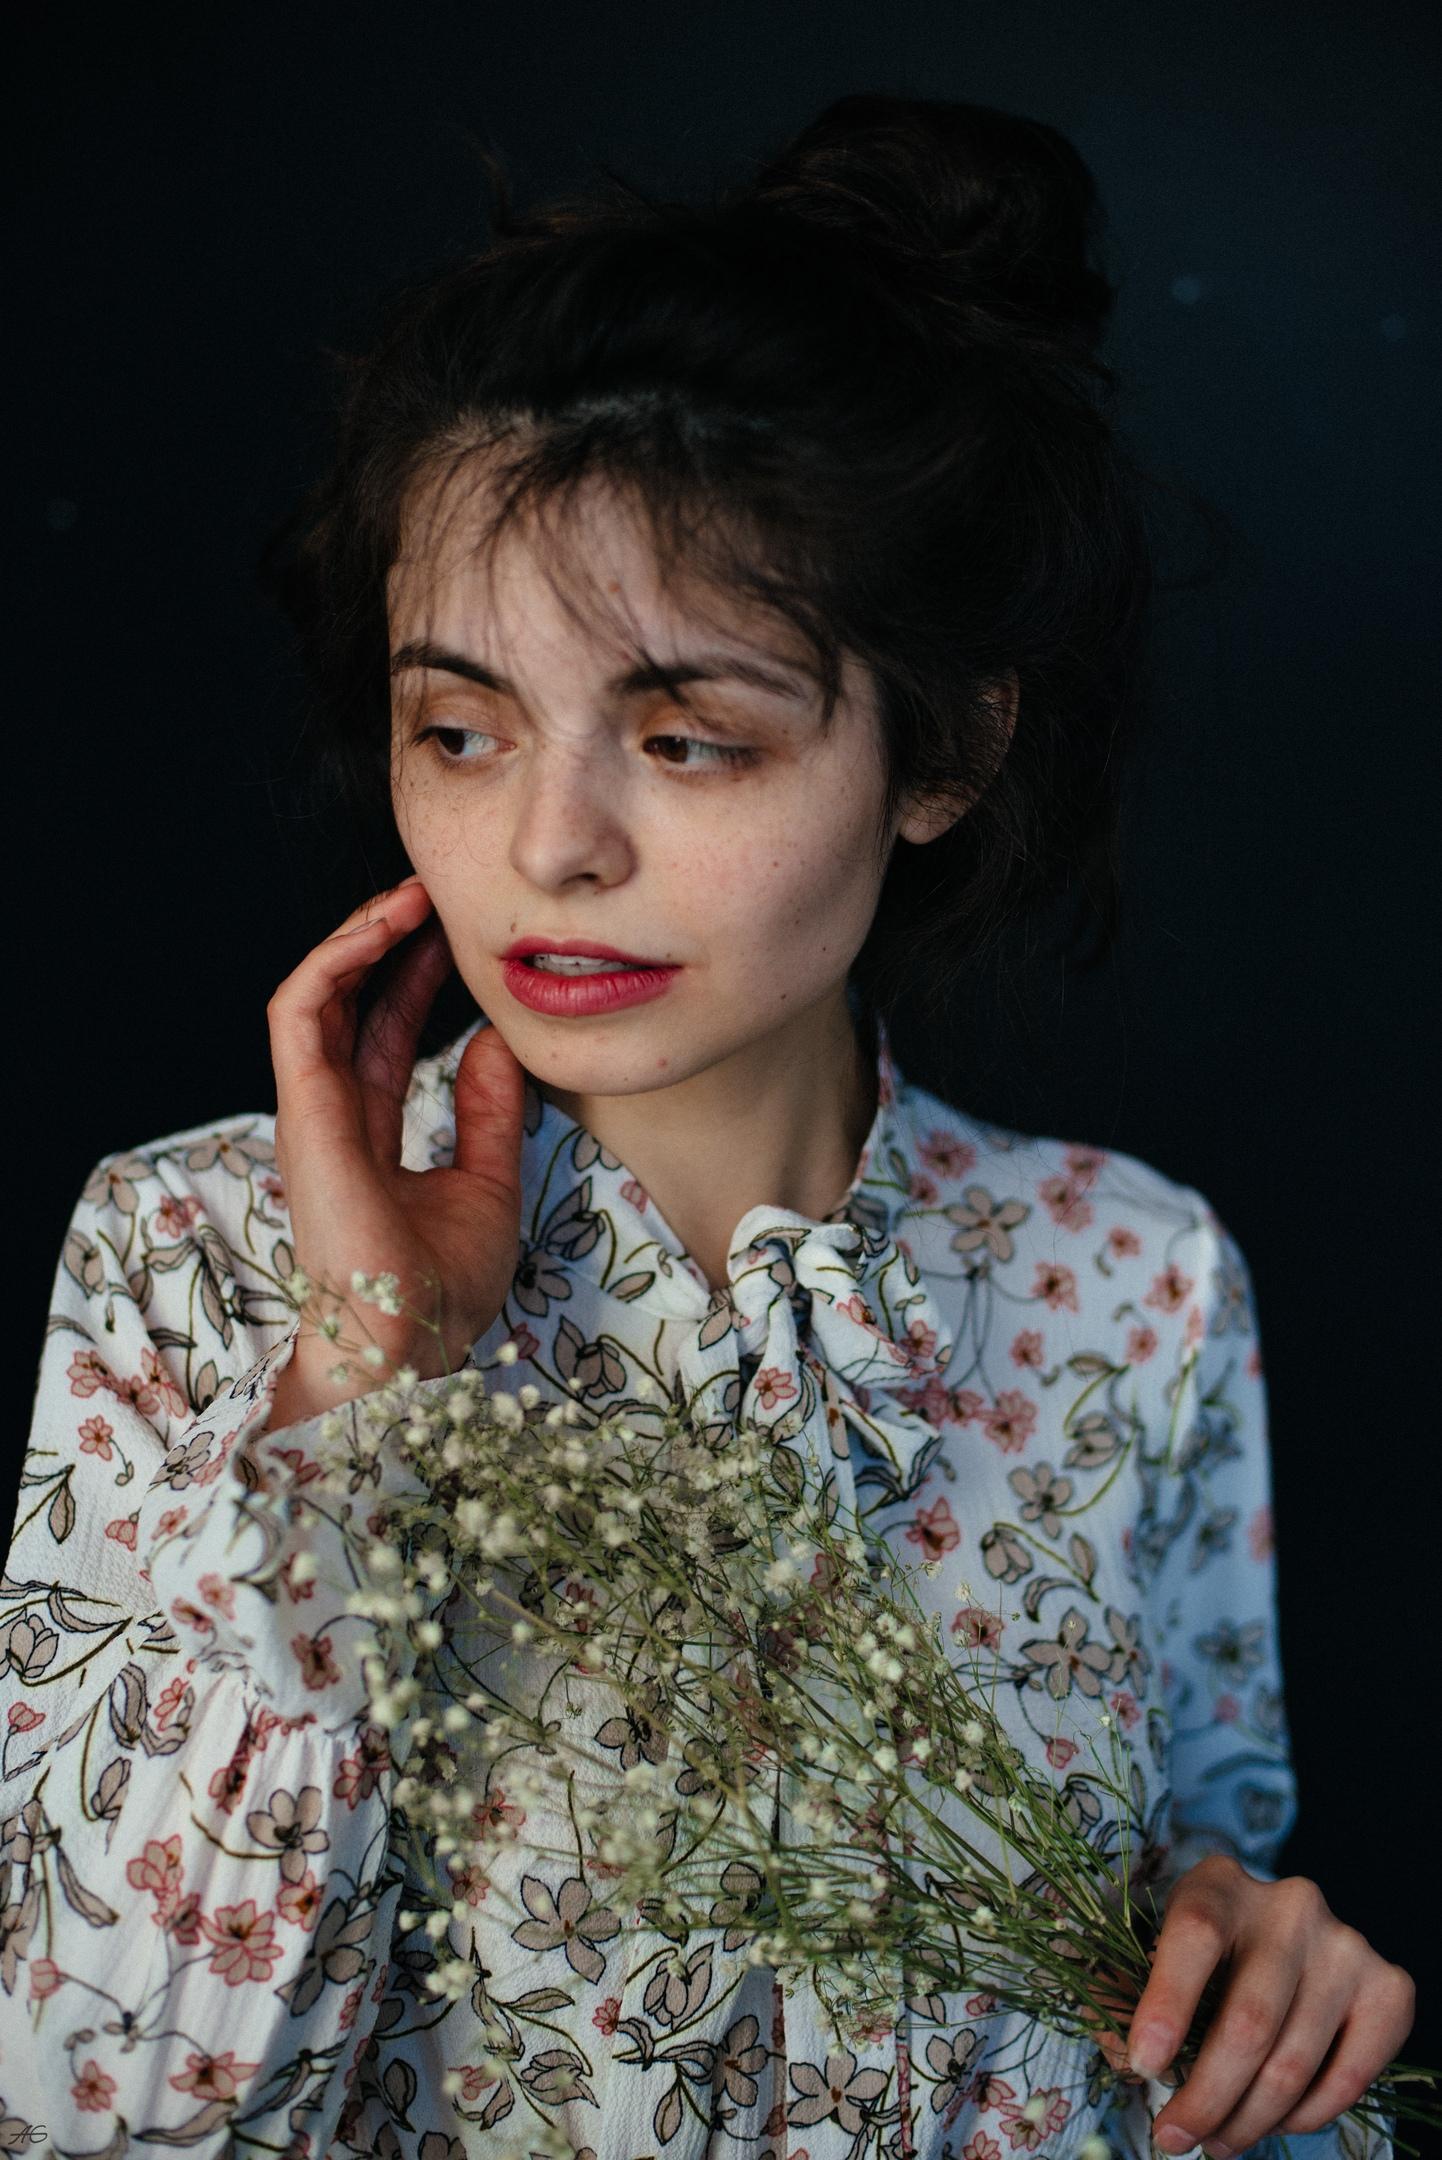 https://youngfolks.ru/pub/model-alina-avkhadieva-32662214